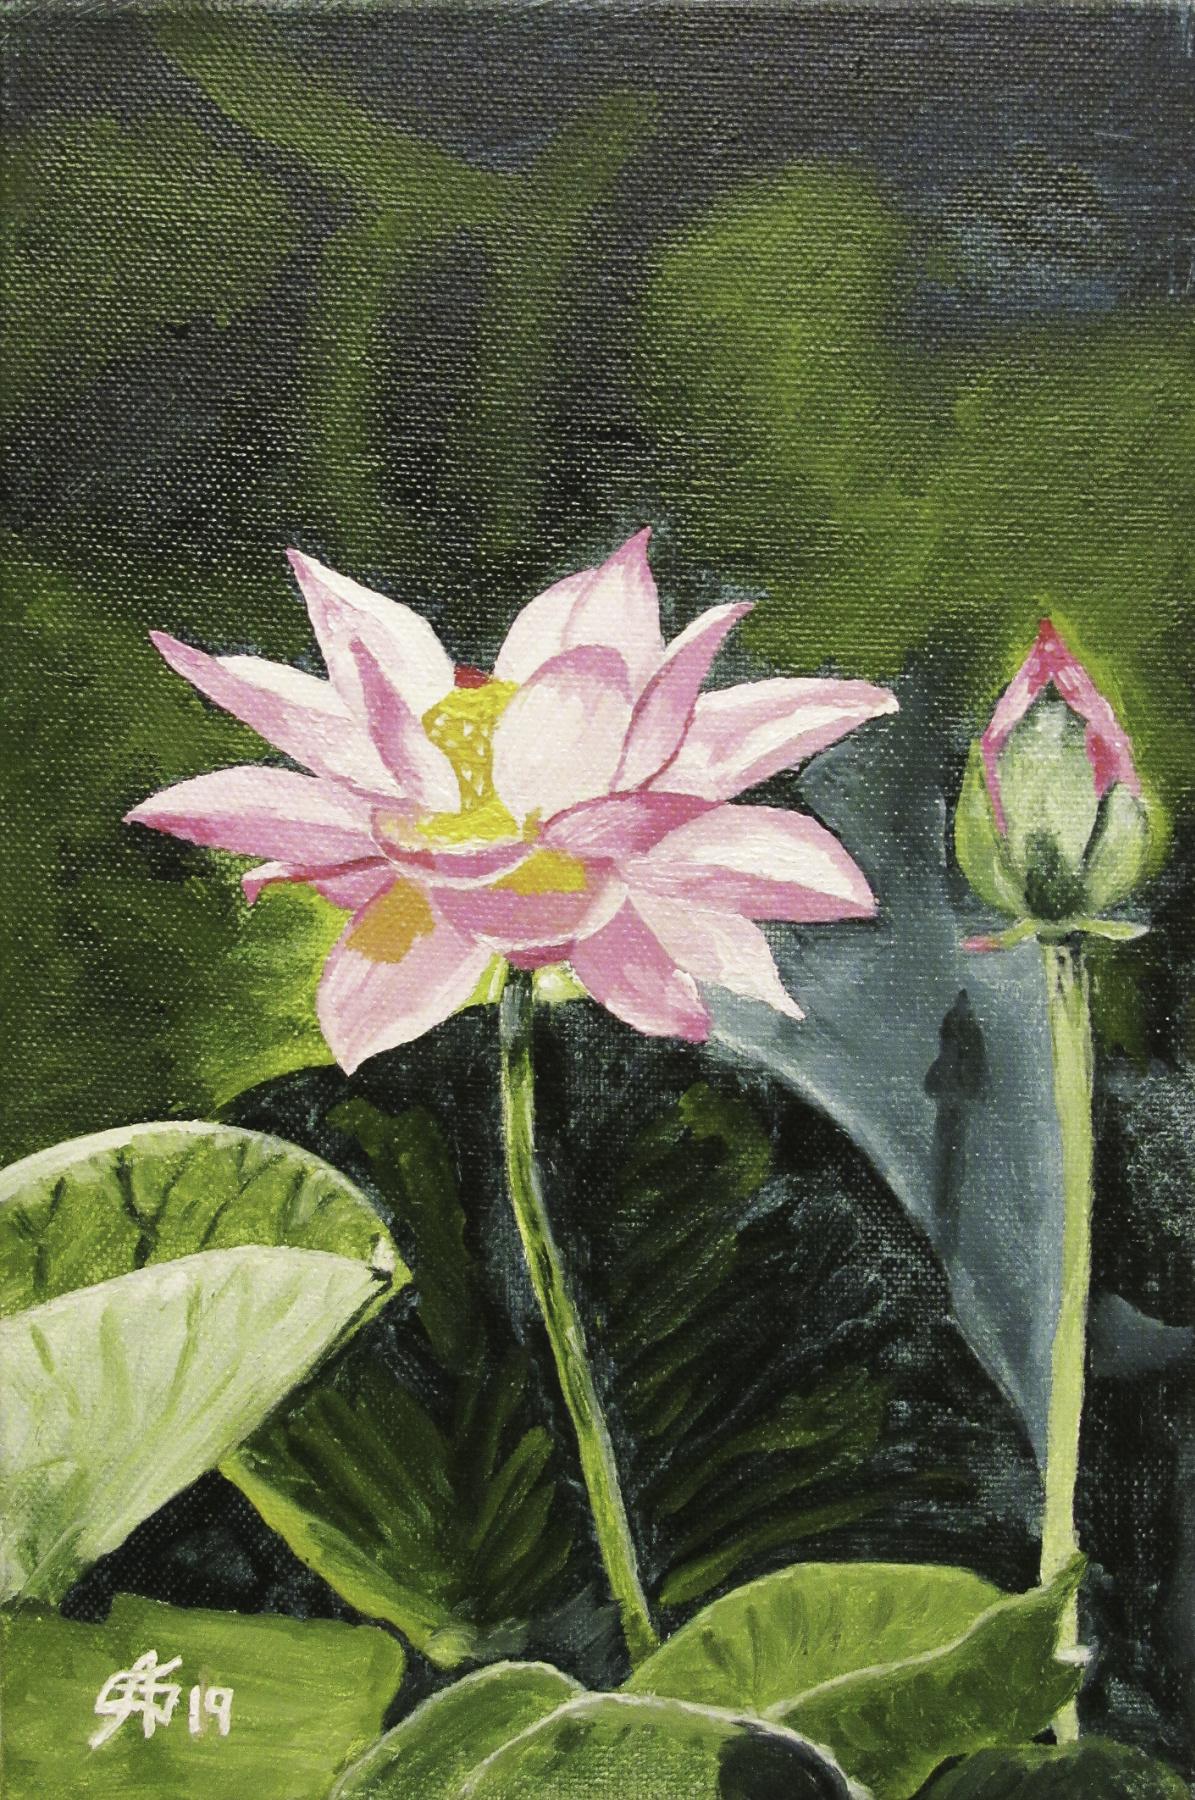 Artashes Vladimirovich Badalyan. Lotus - xm - 30x20